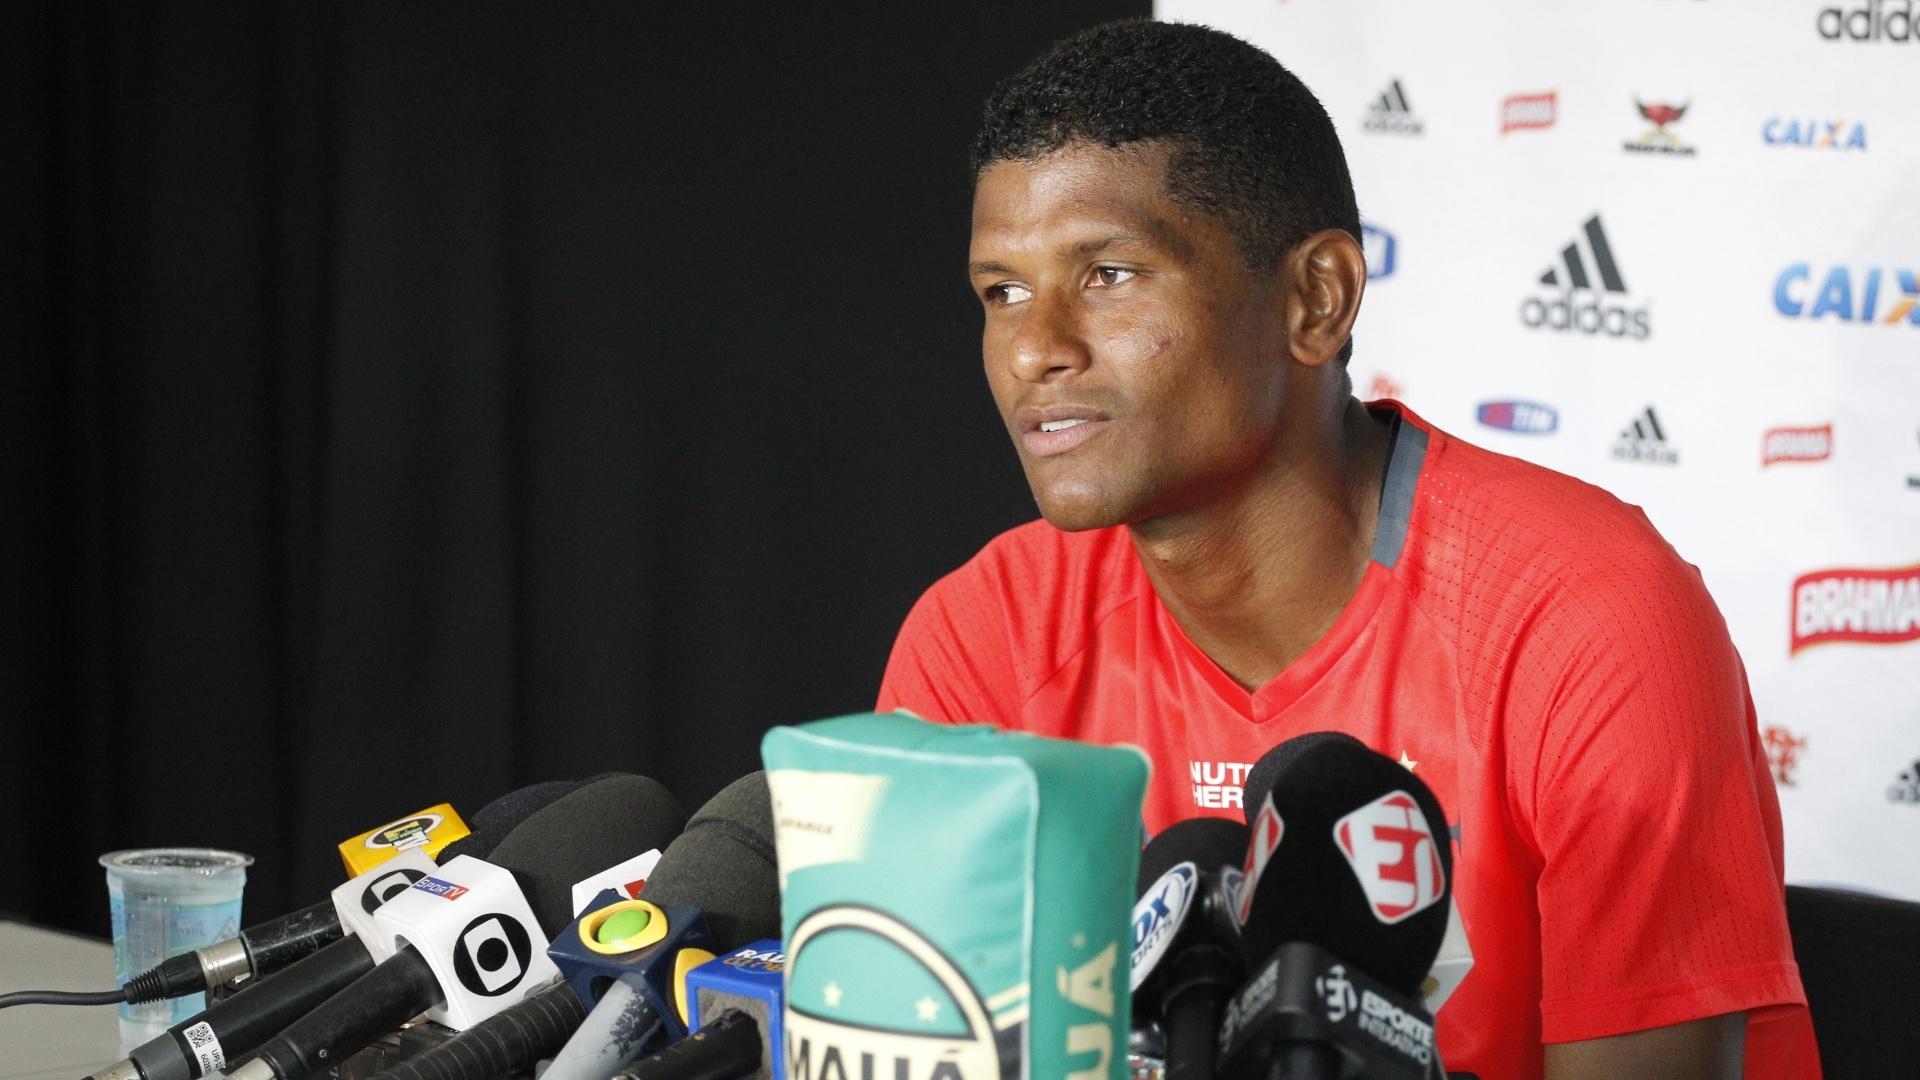 Márcio Araújo concede entrevista coletiva após treinamento do Flamengo na Gávea